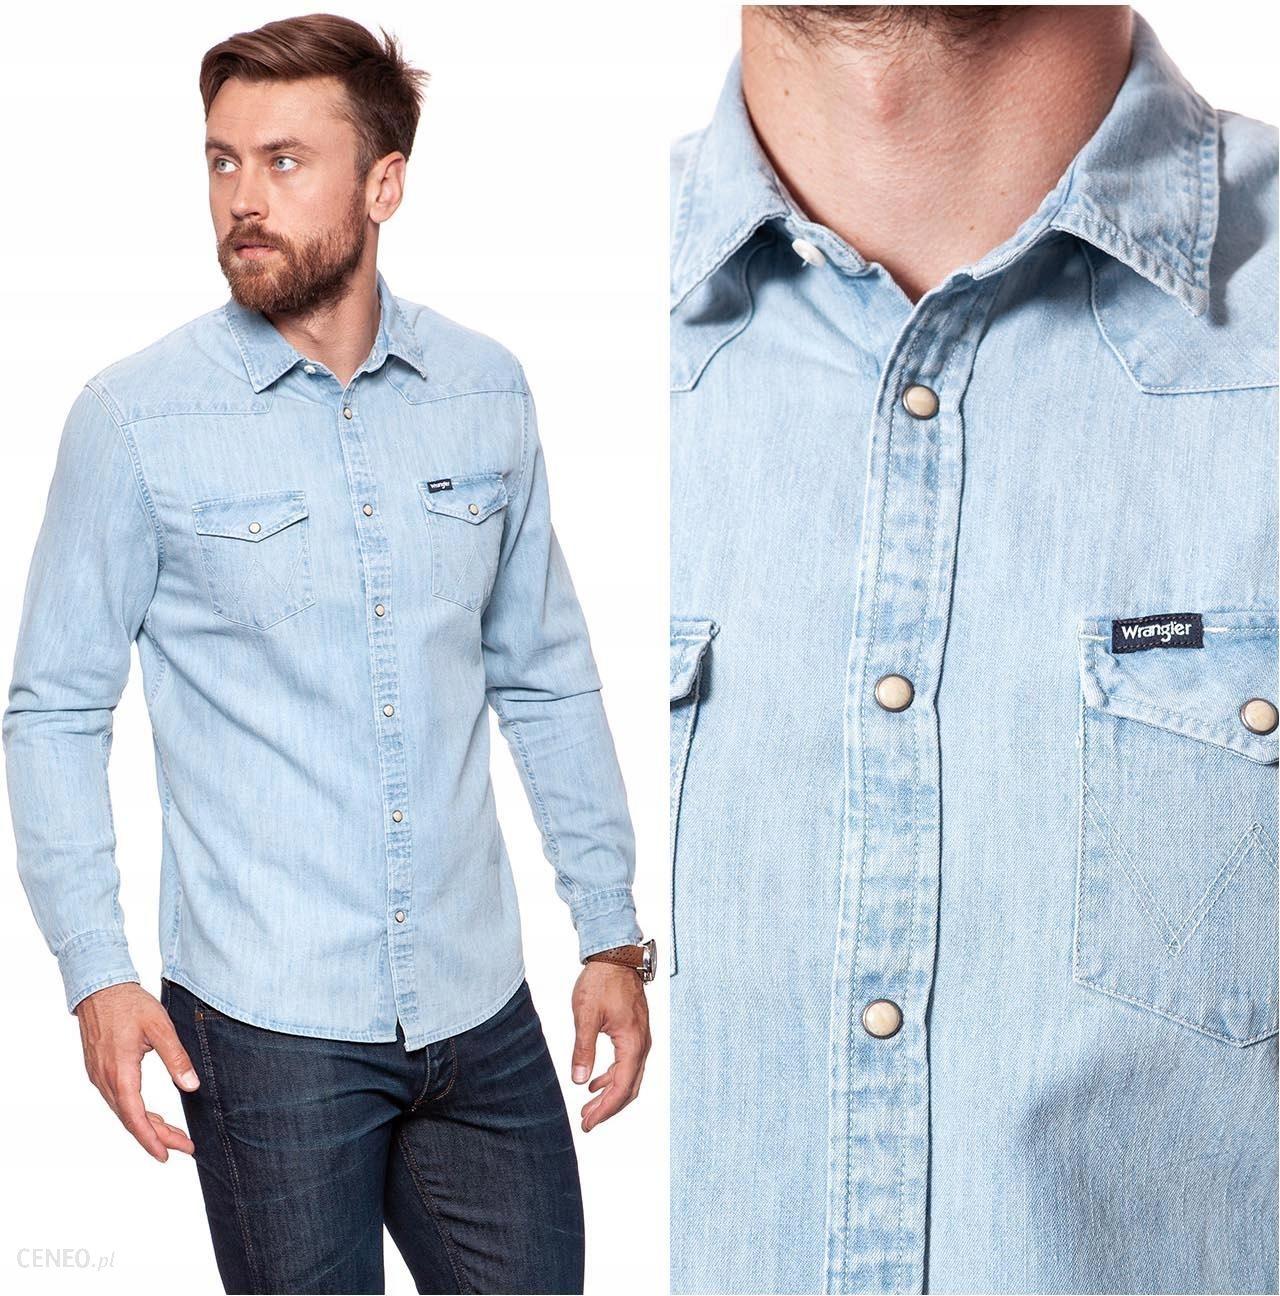 Wrangler Western Shirt Koszula Męska Jeansowa L Ceny i  fE09Y